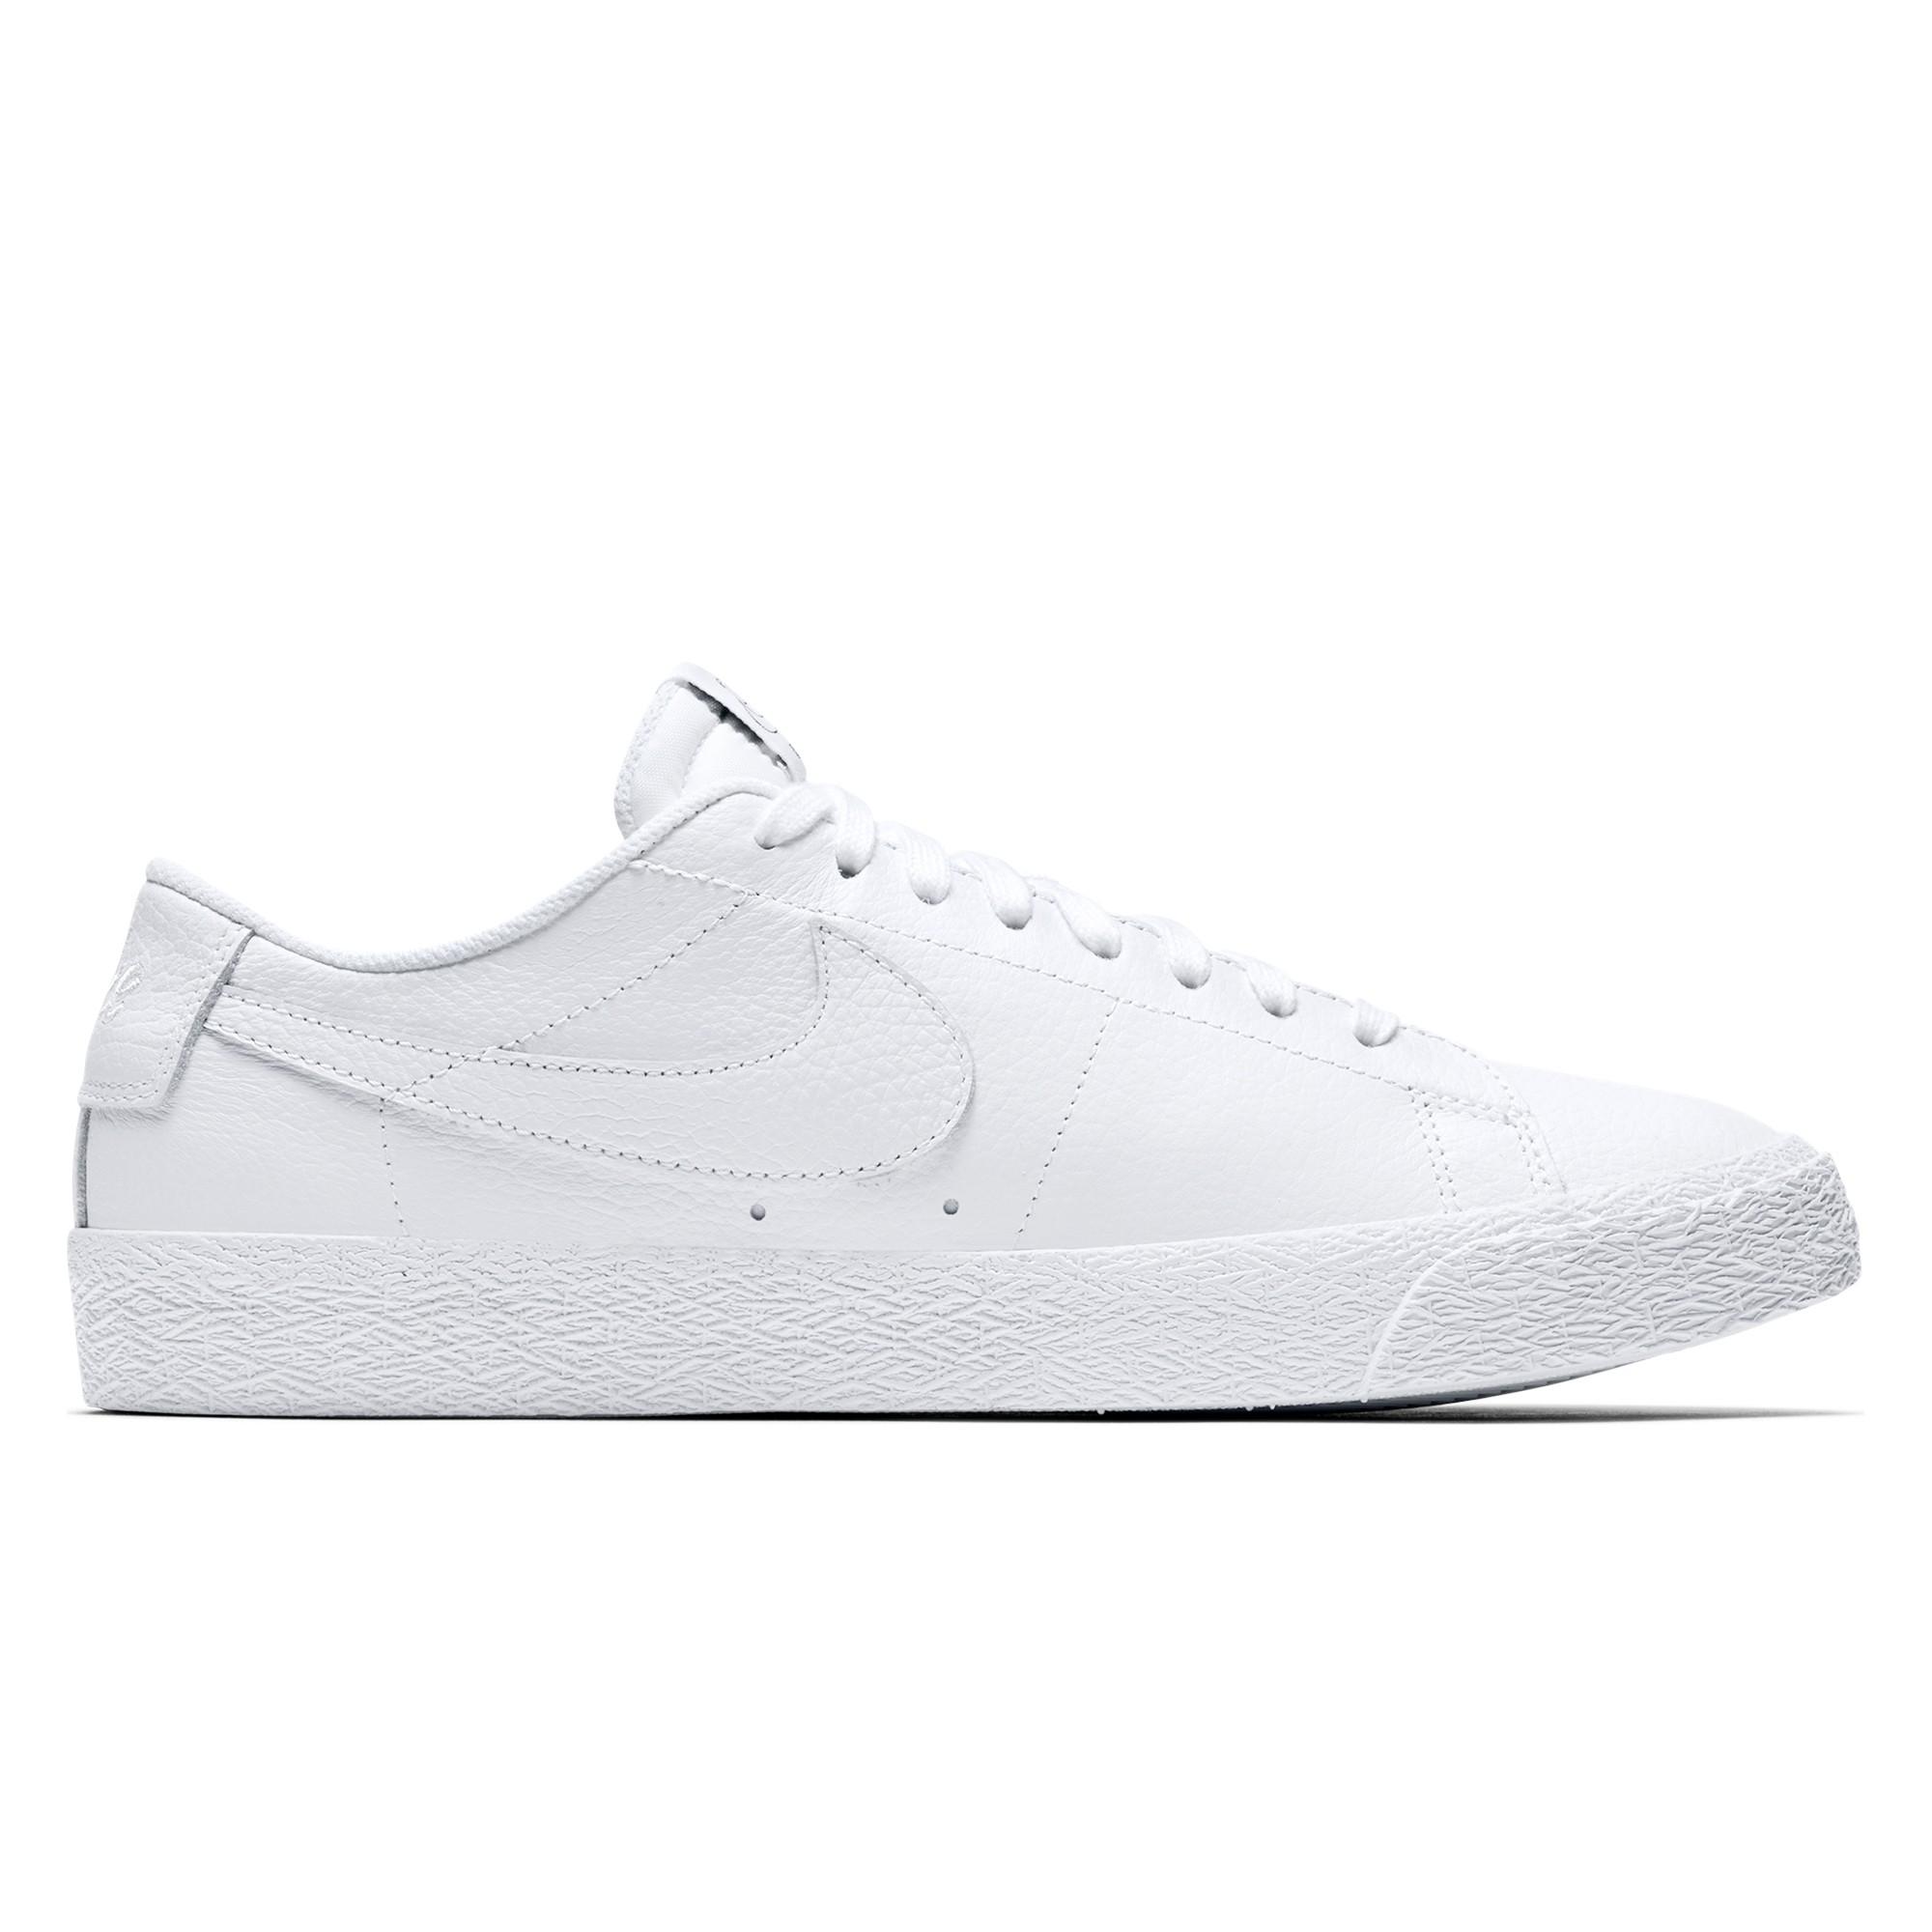 check out 057e3 1850e Nike SB x NBA Zoom Blazer Low (White/White-Rush Blue-University Red)